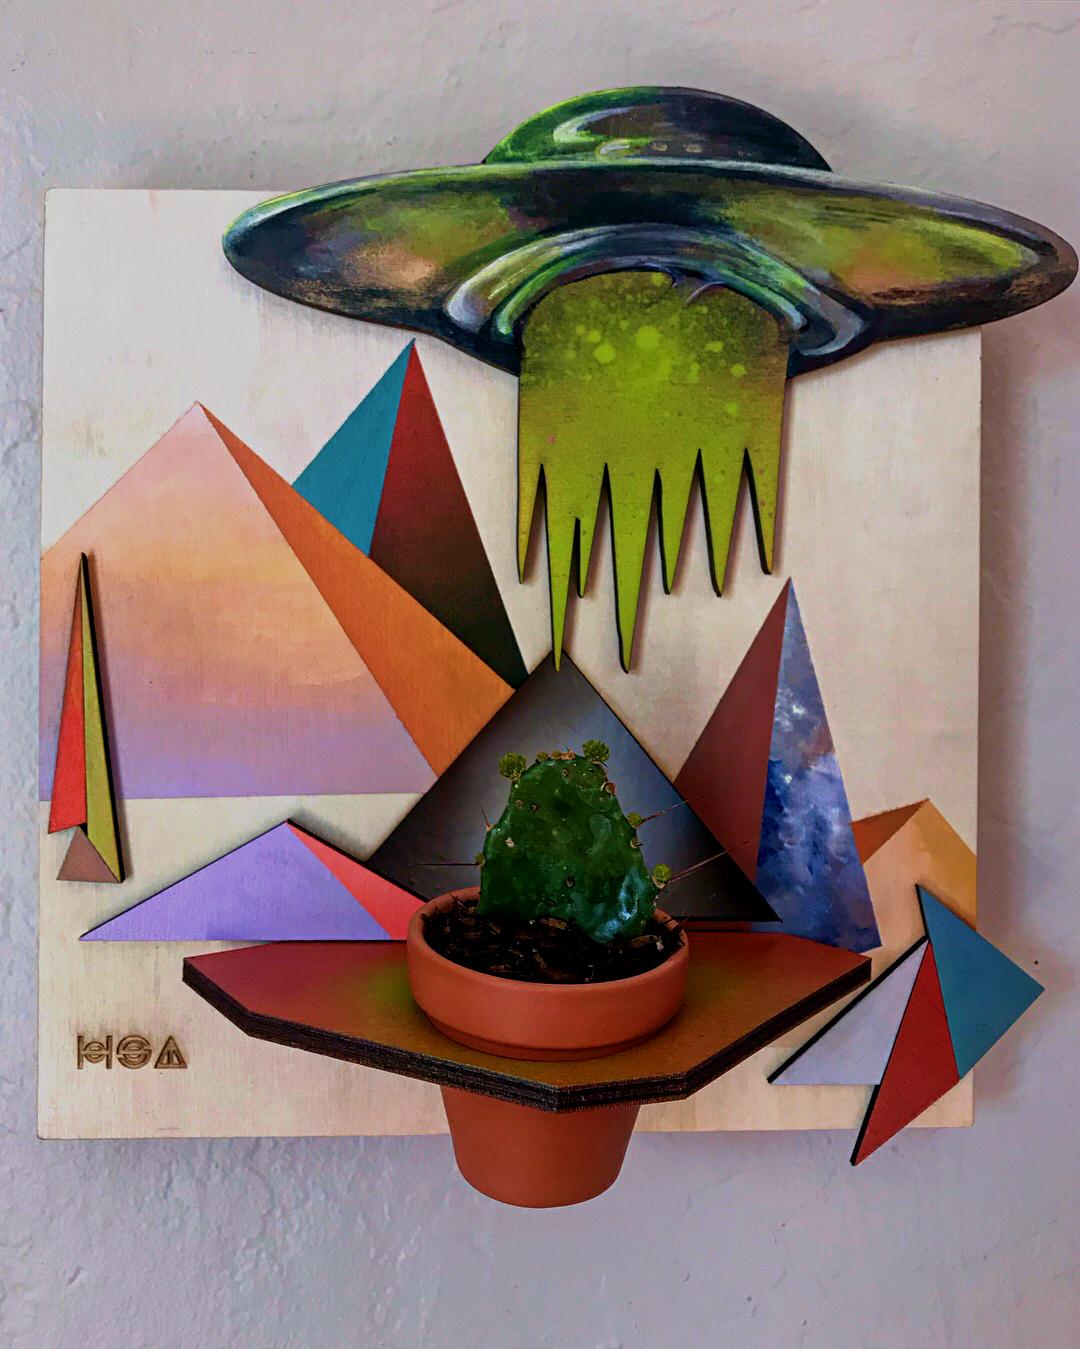 "Rachel Barnes Invaisive, 2018 Acrylic on Wood, Succulent 10x10x1.5"""